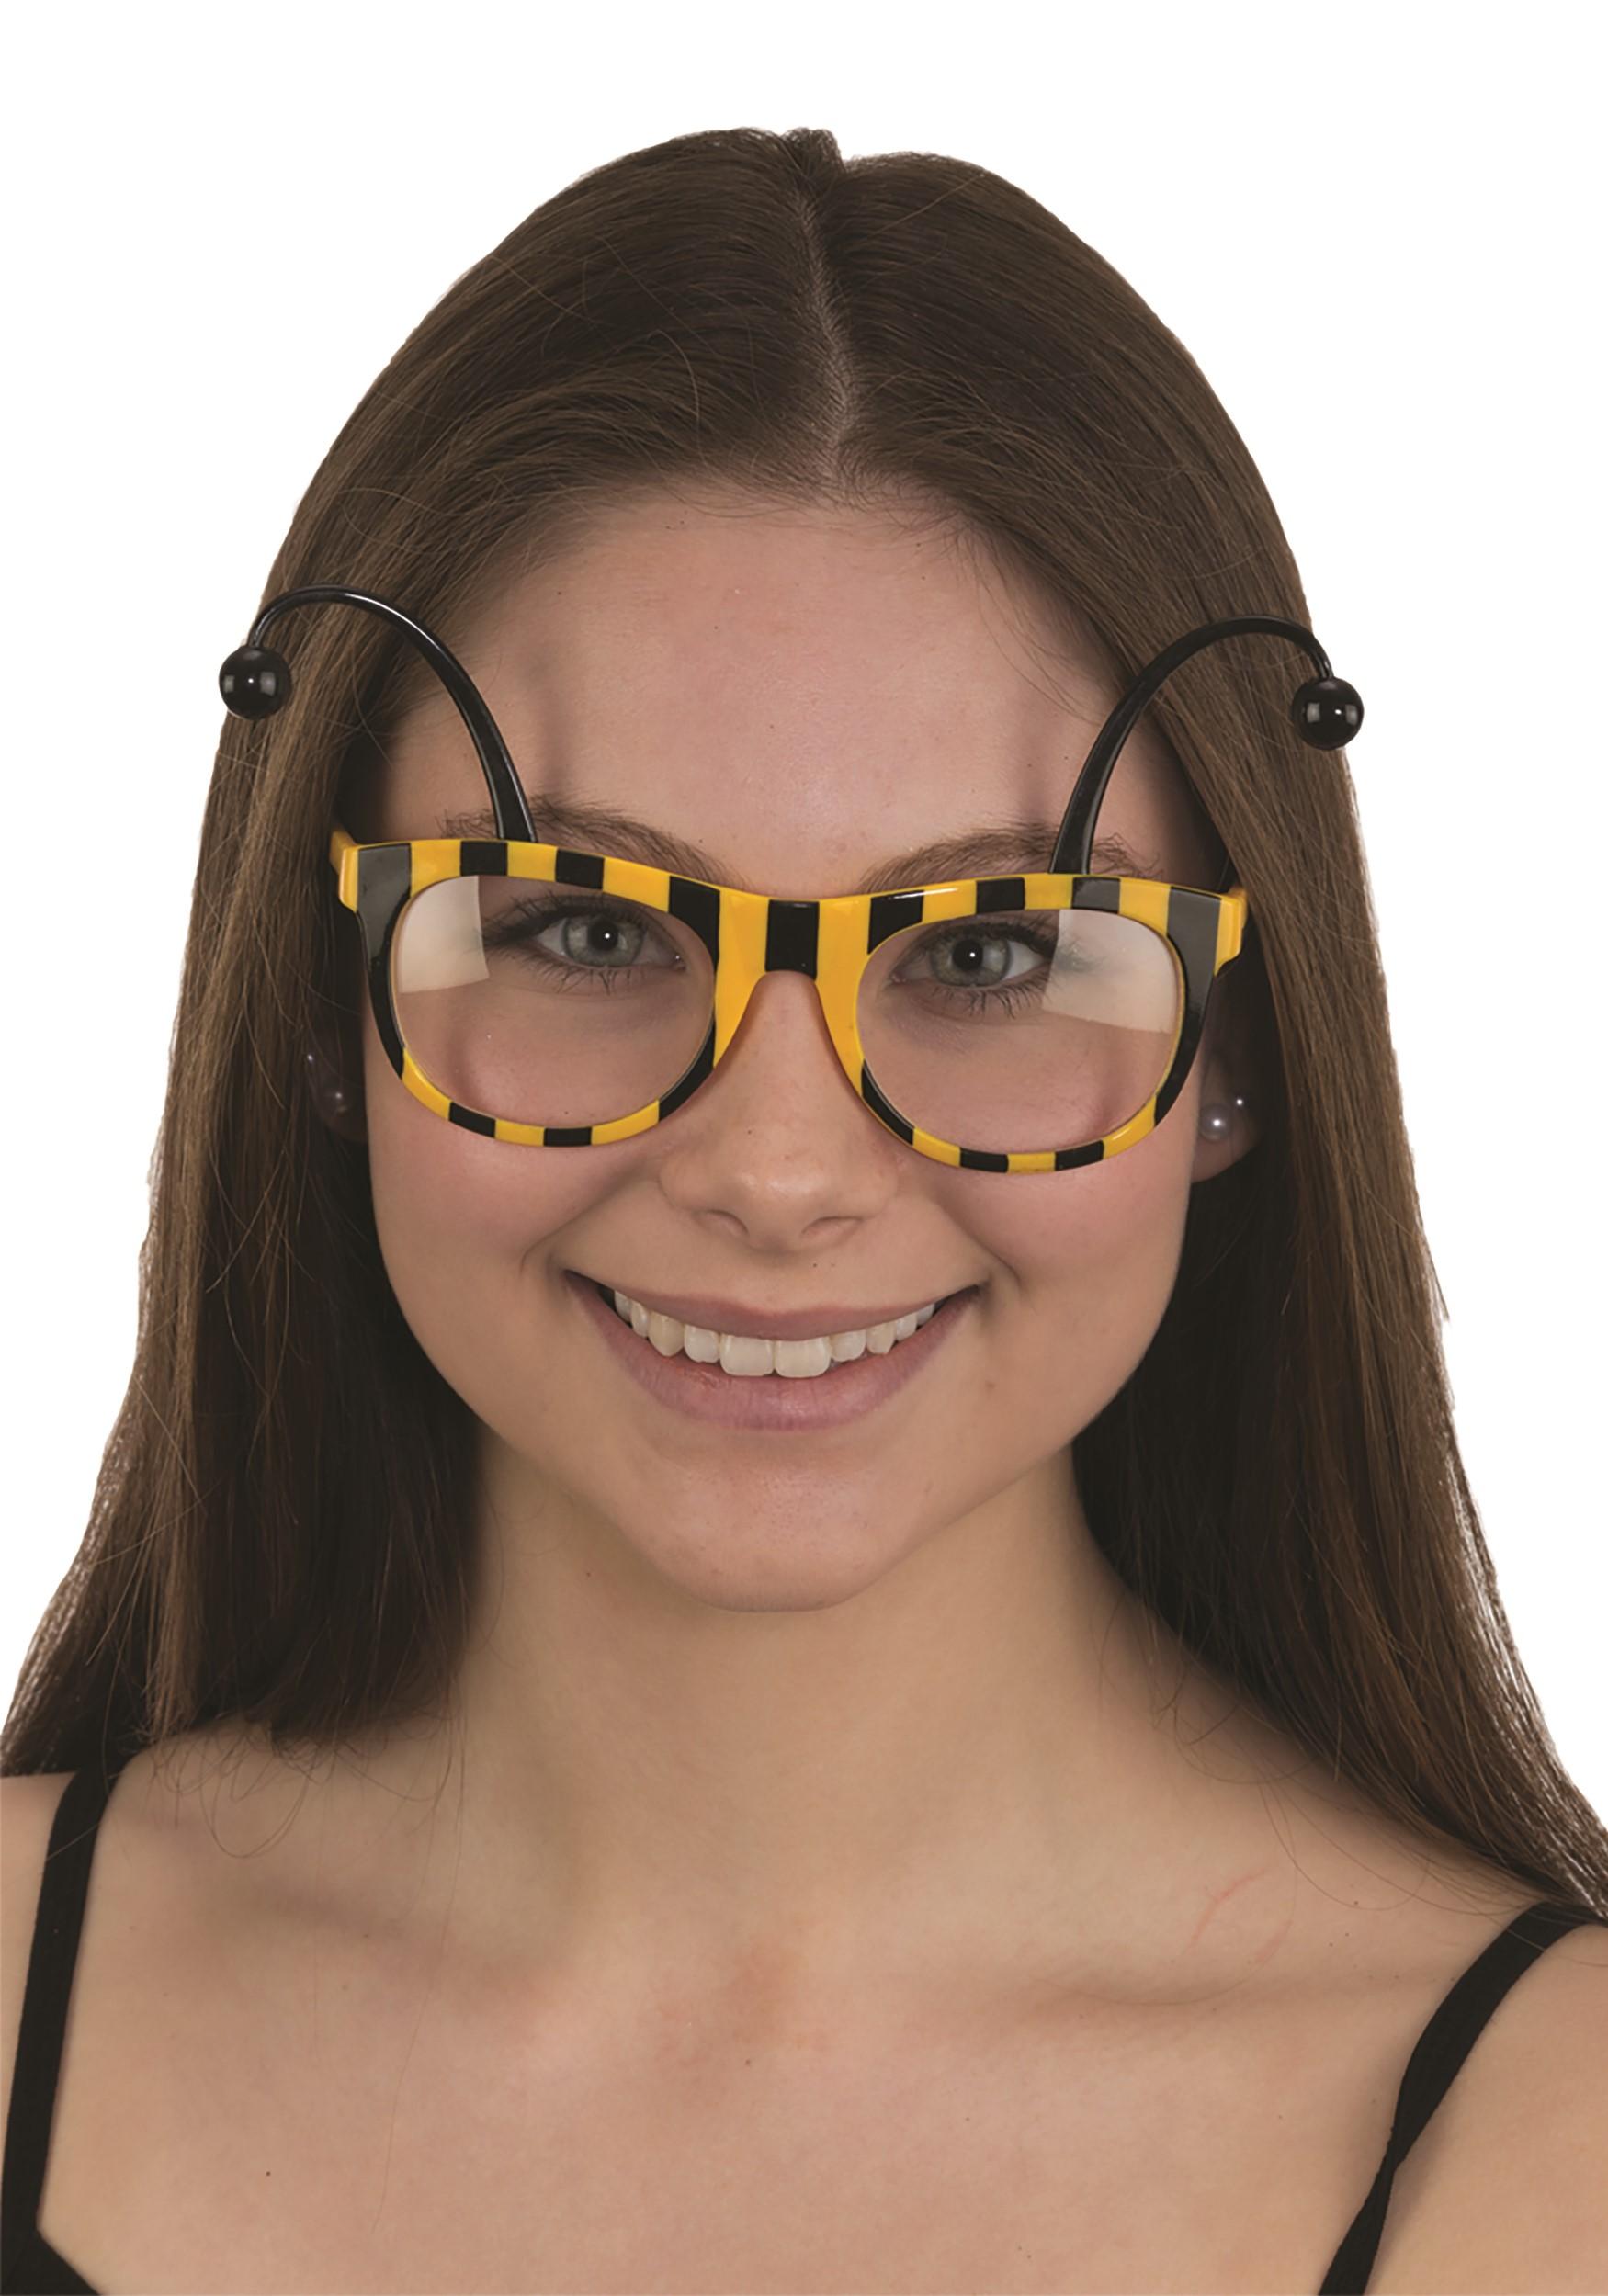 Bee Glasses Costume Accessory